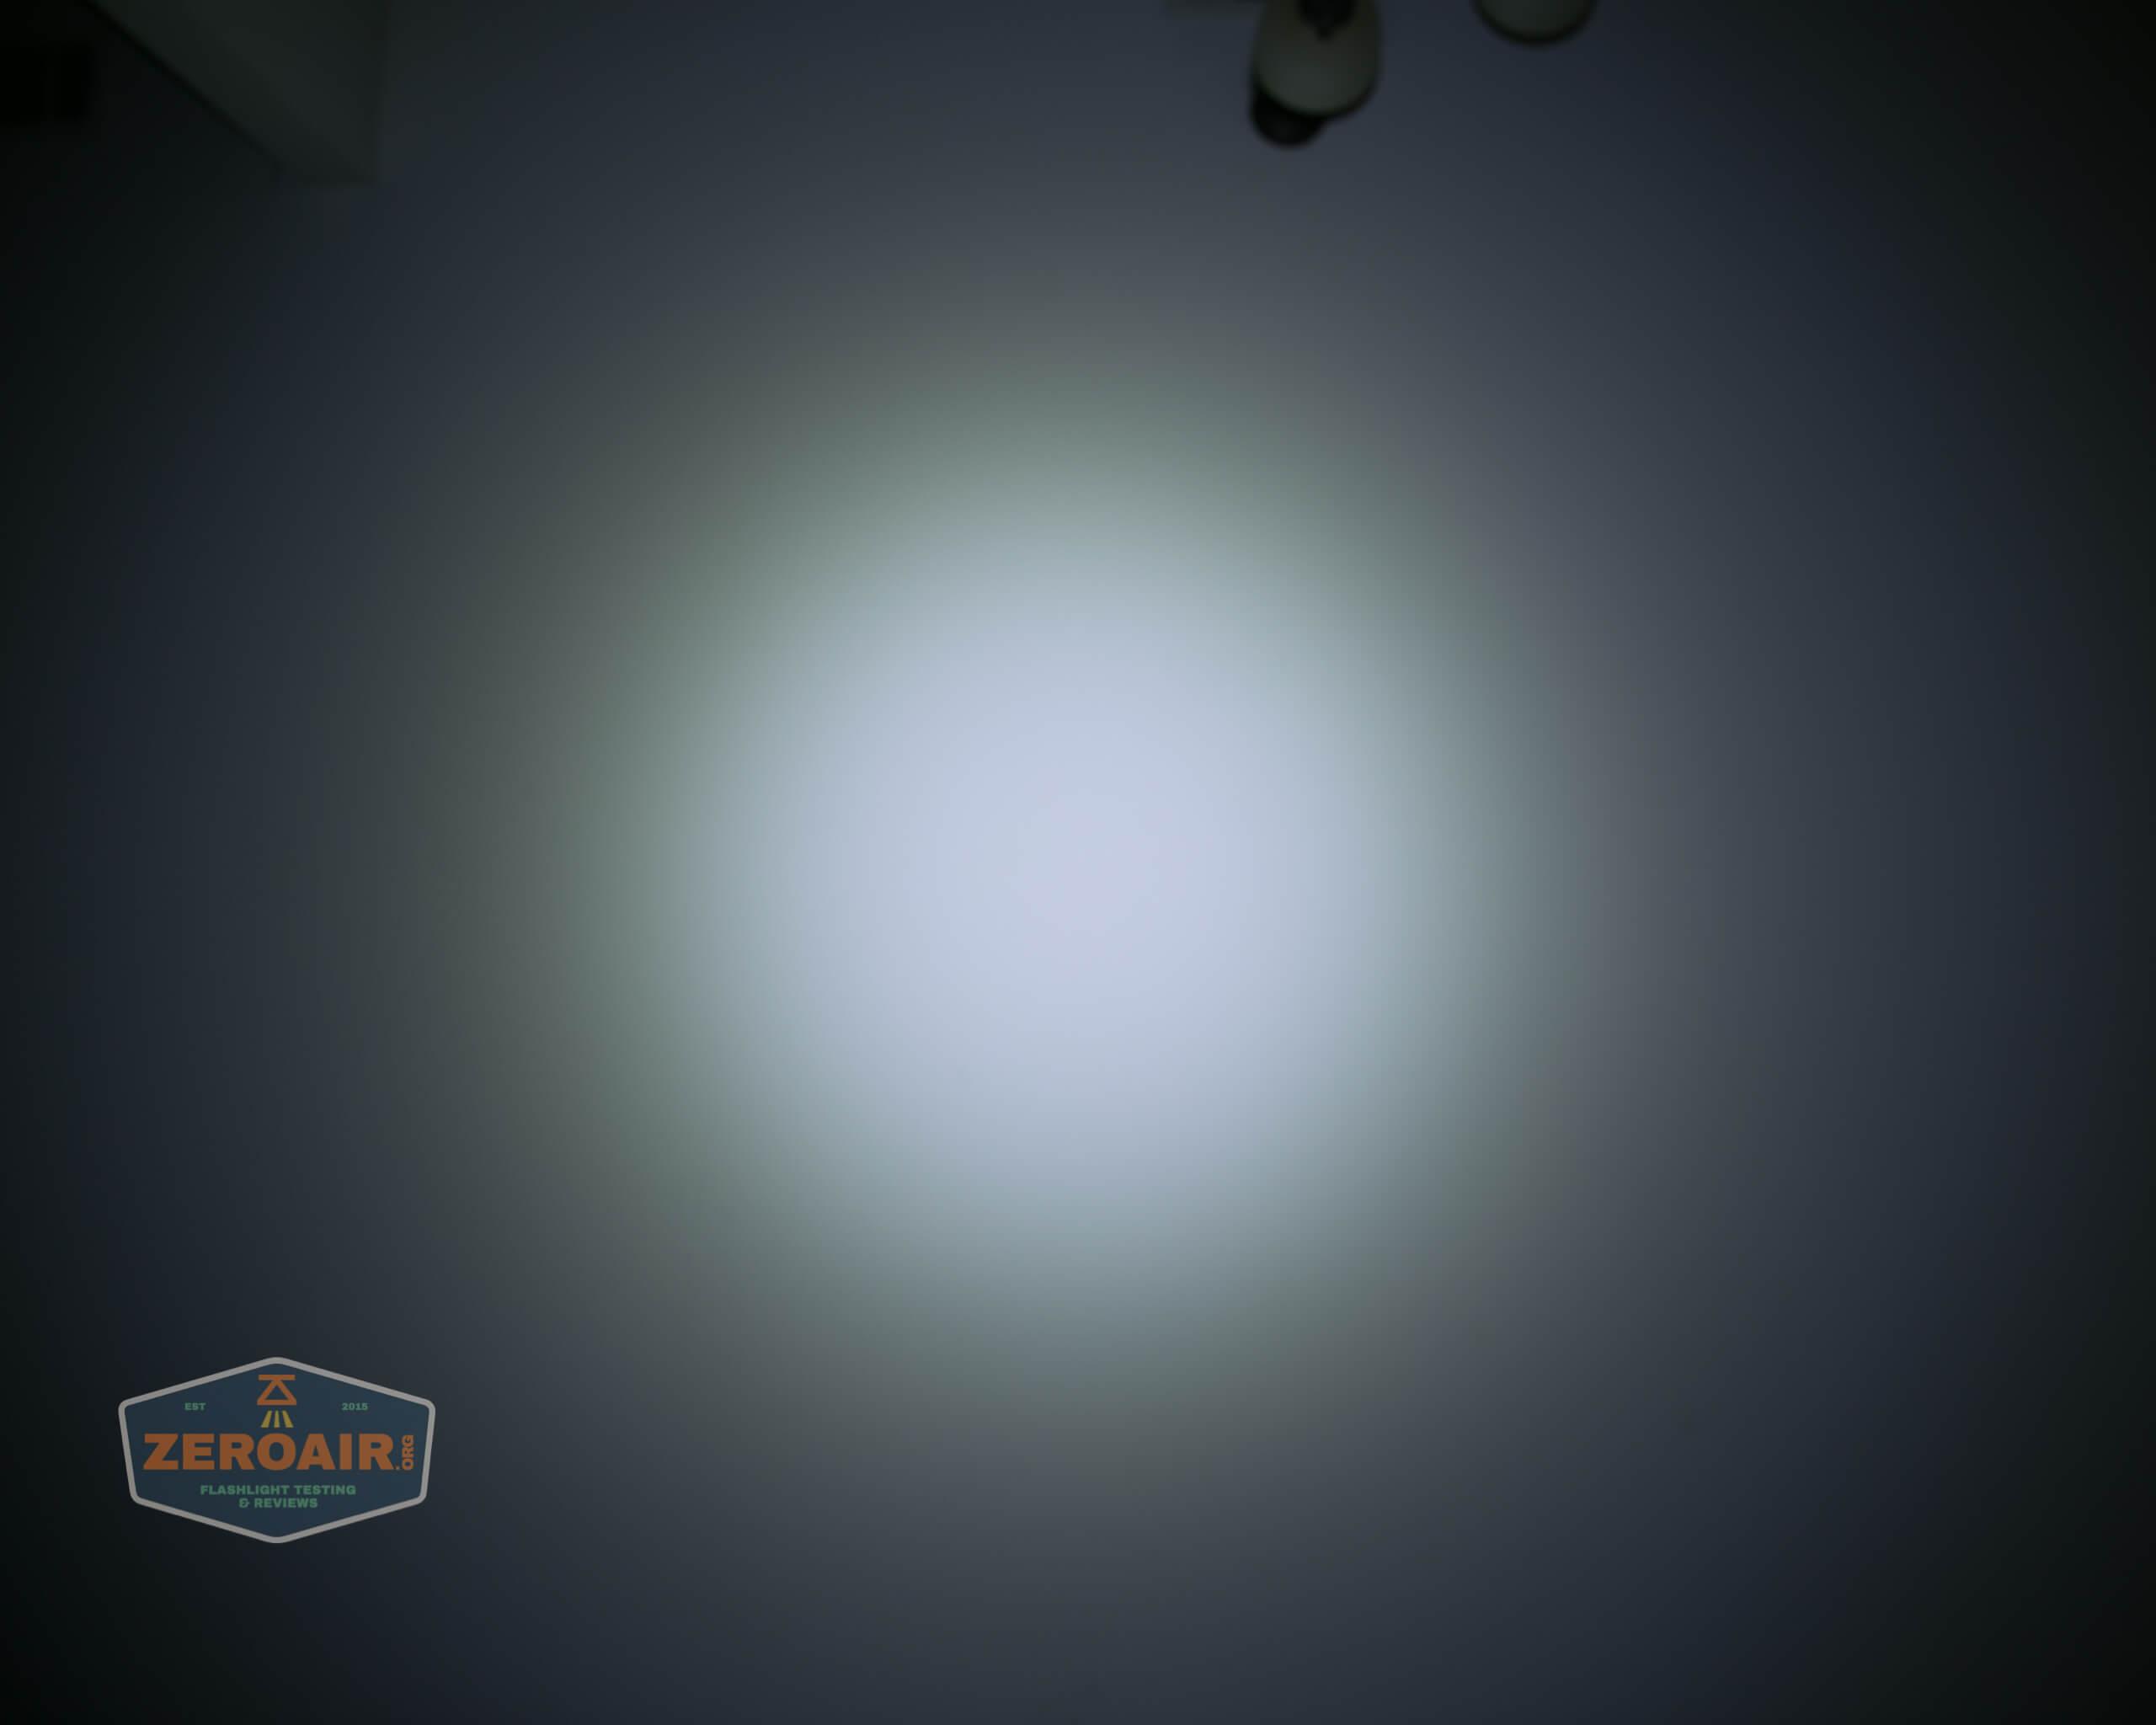 freasygears cyansky m3 titanium pocket flashlight beamshot ceiling 4